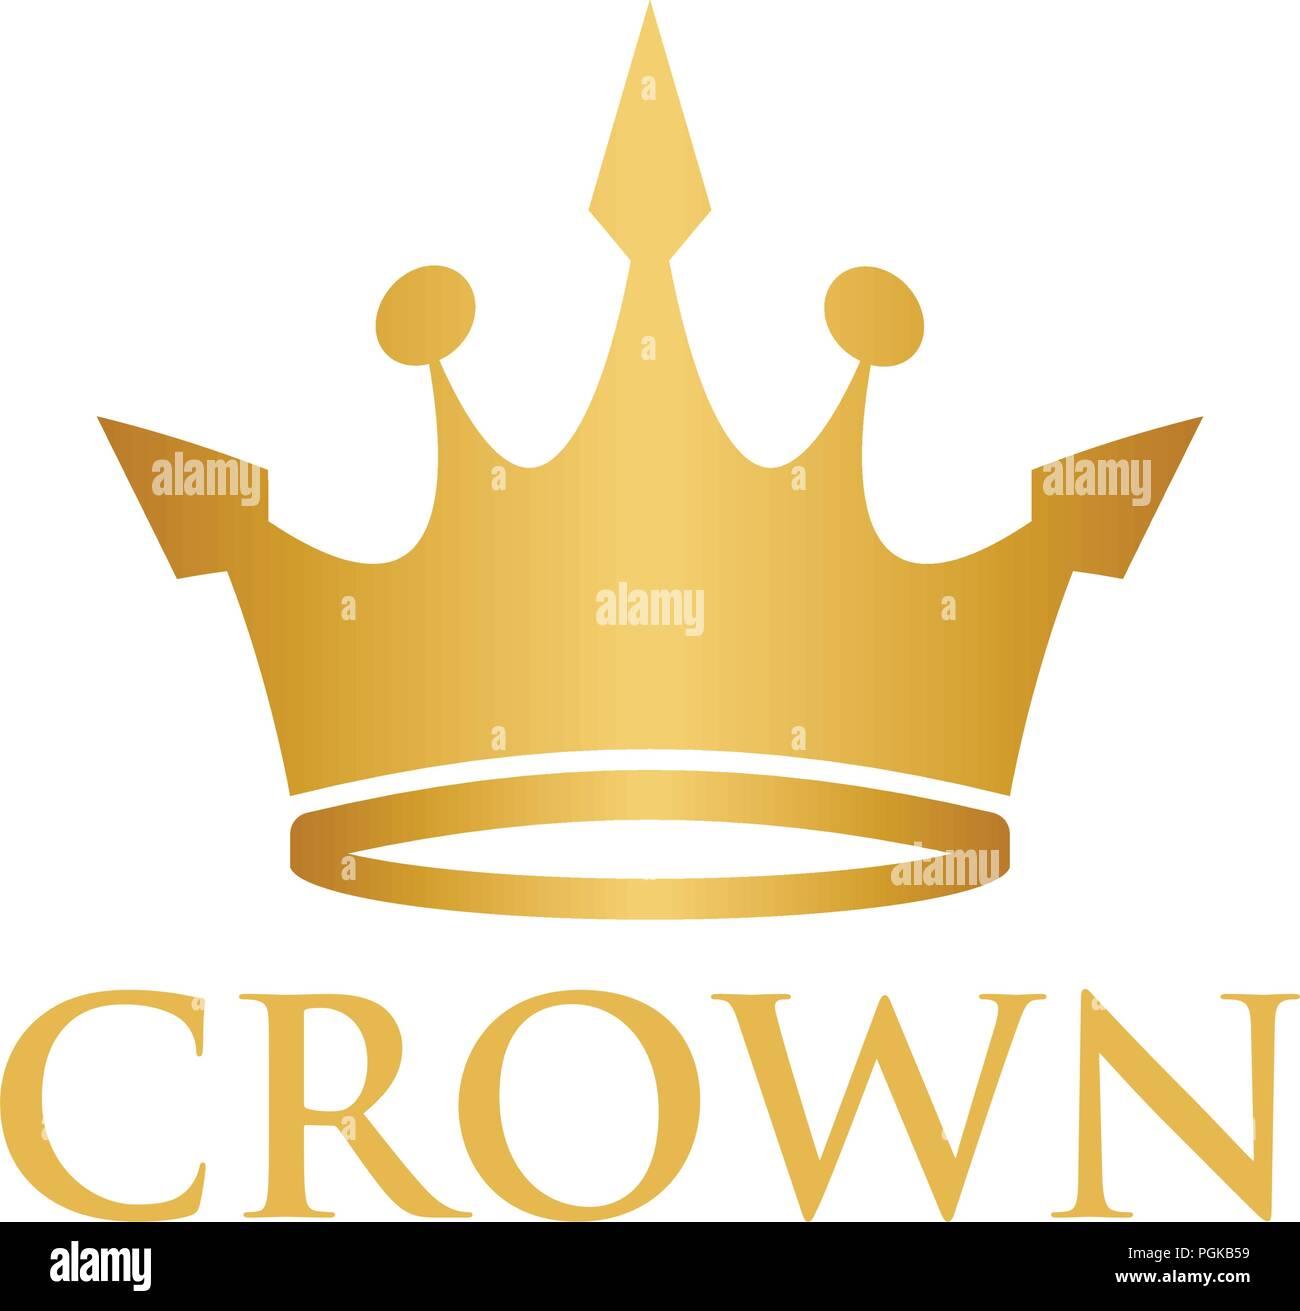 King Crown Logo Template Imágenes De Stock & King Crown Logo ...